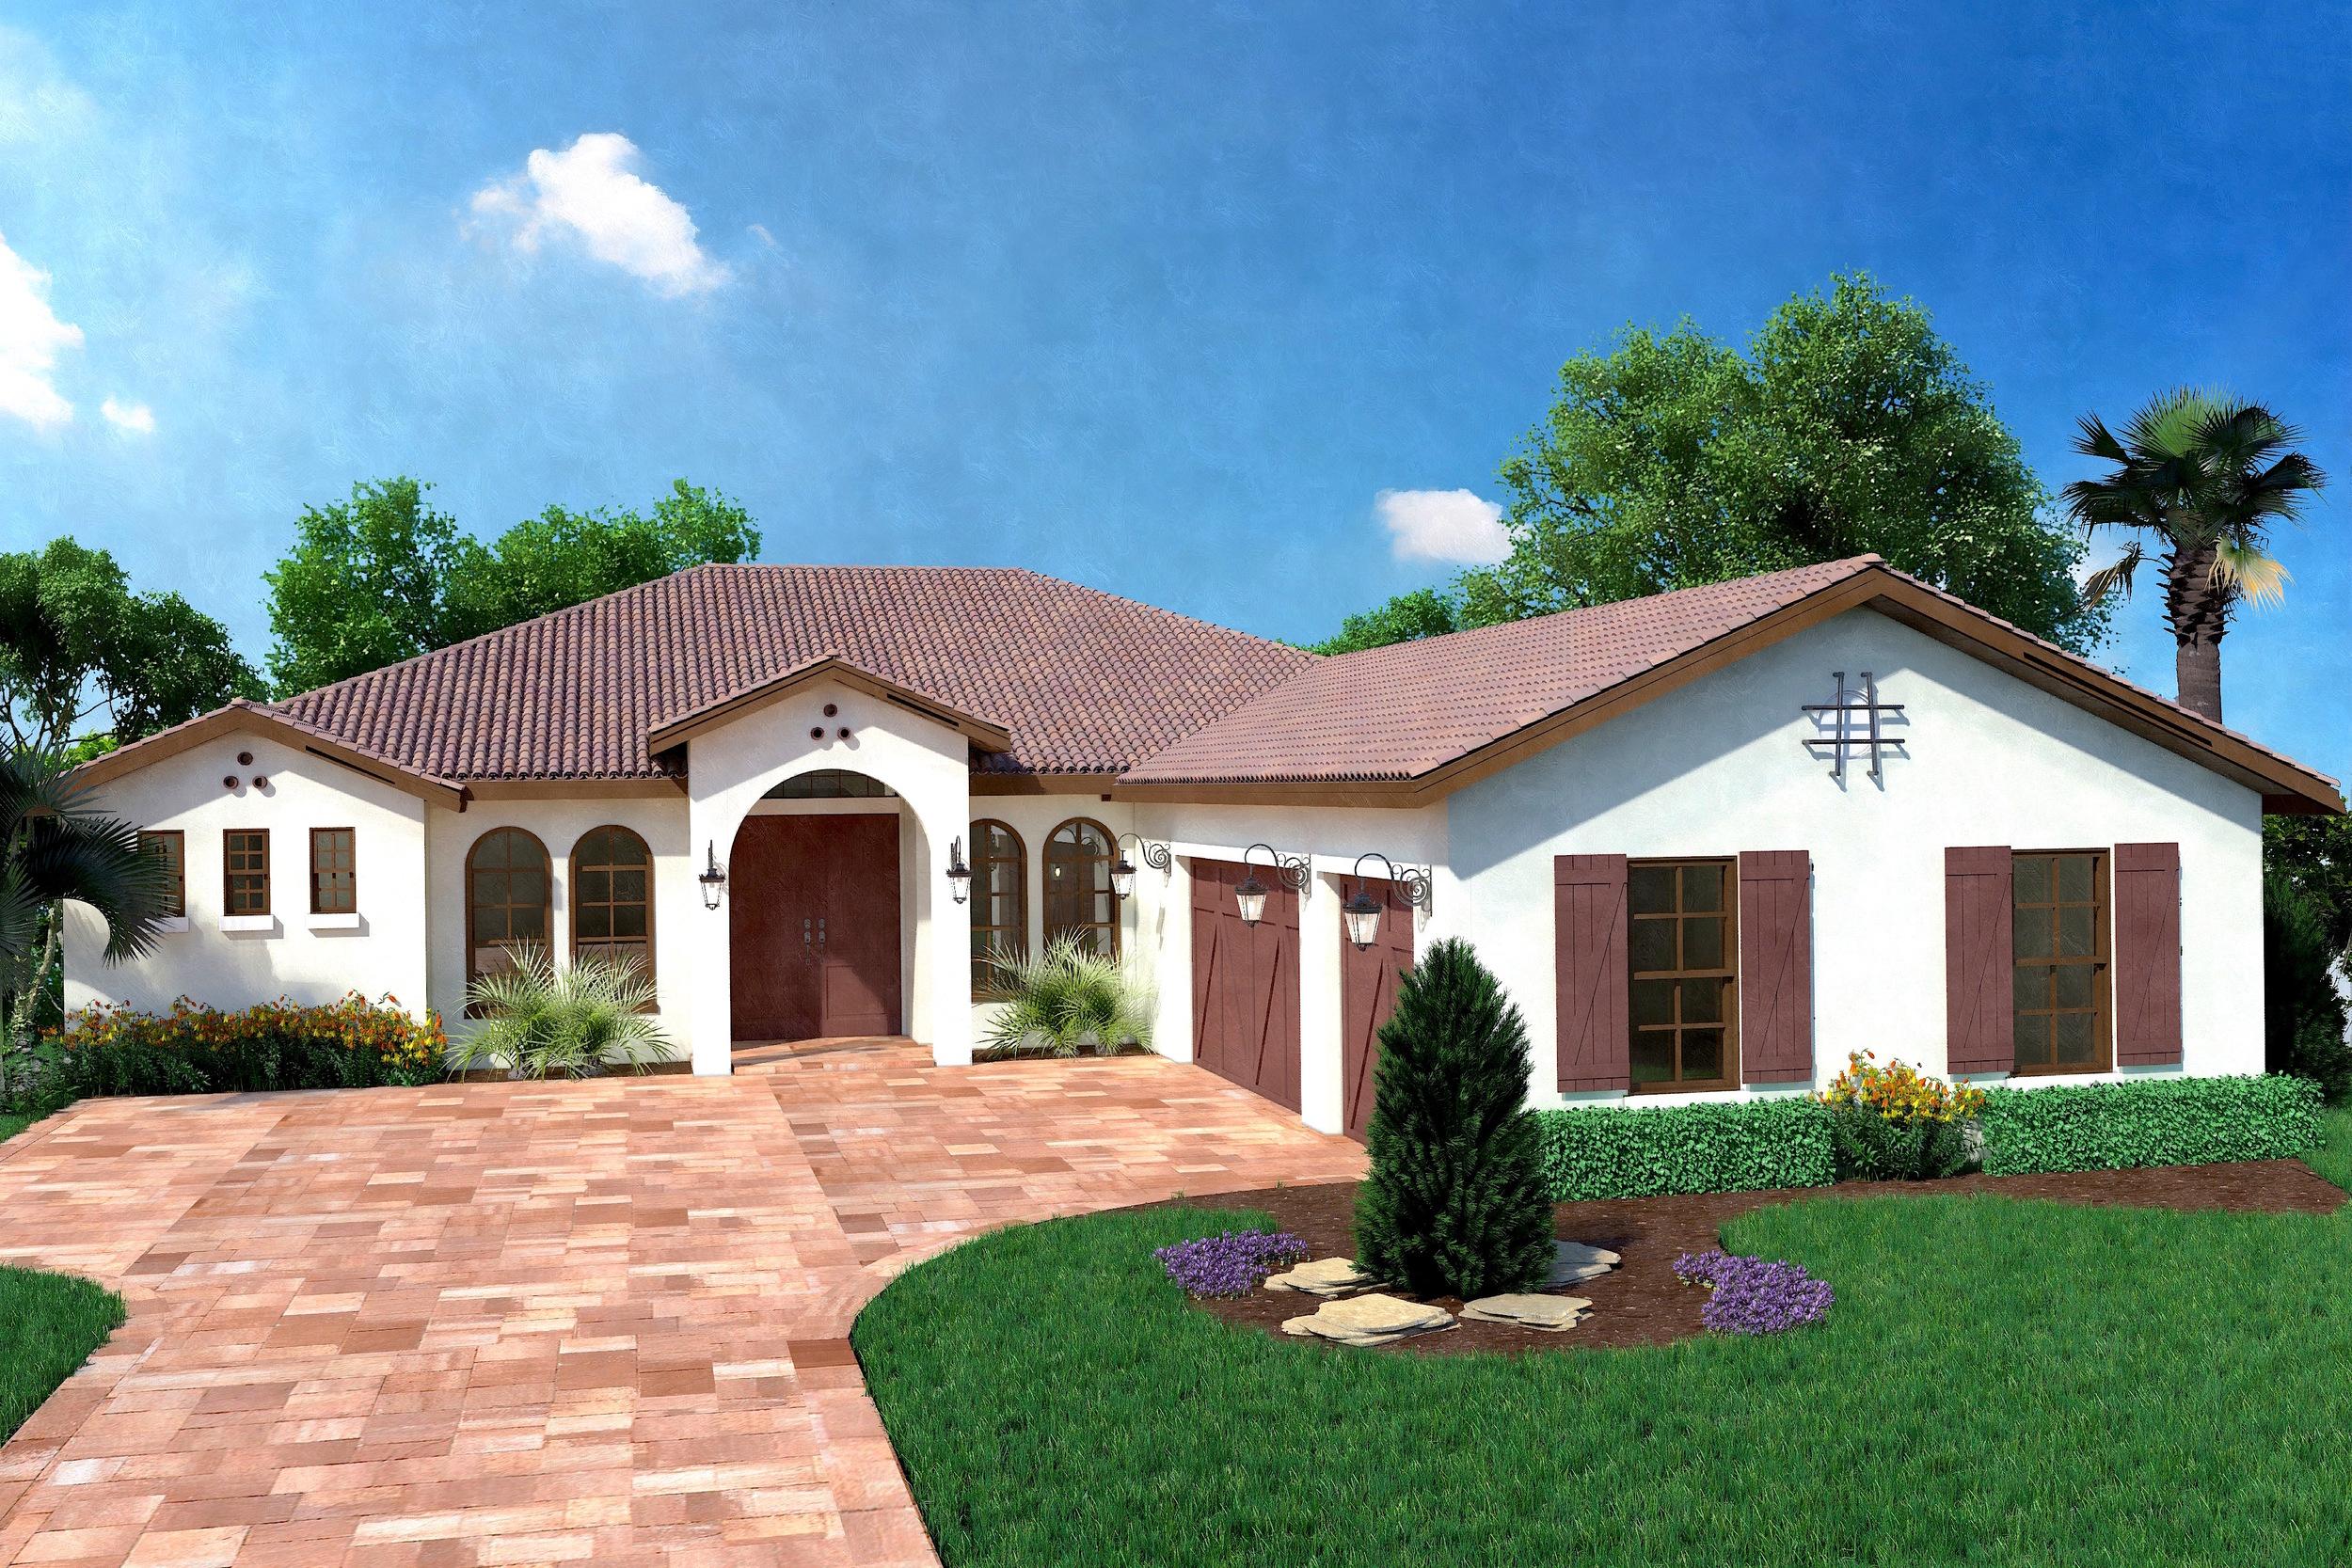 The Azalea MediterraneanElevation at Ashton Oaks in Sarasota, Florida